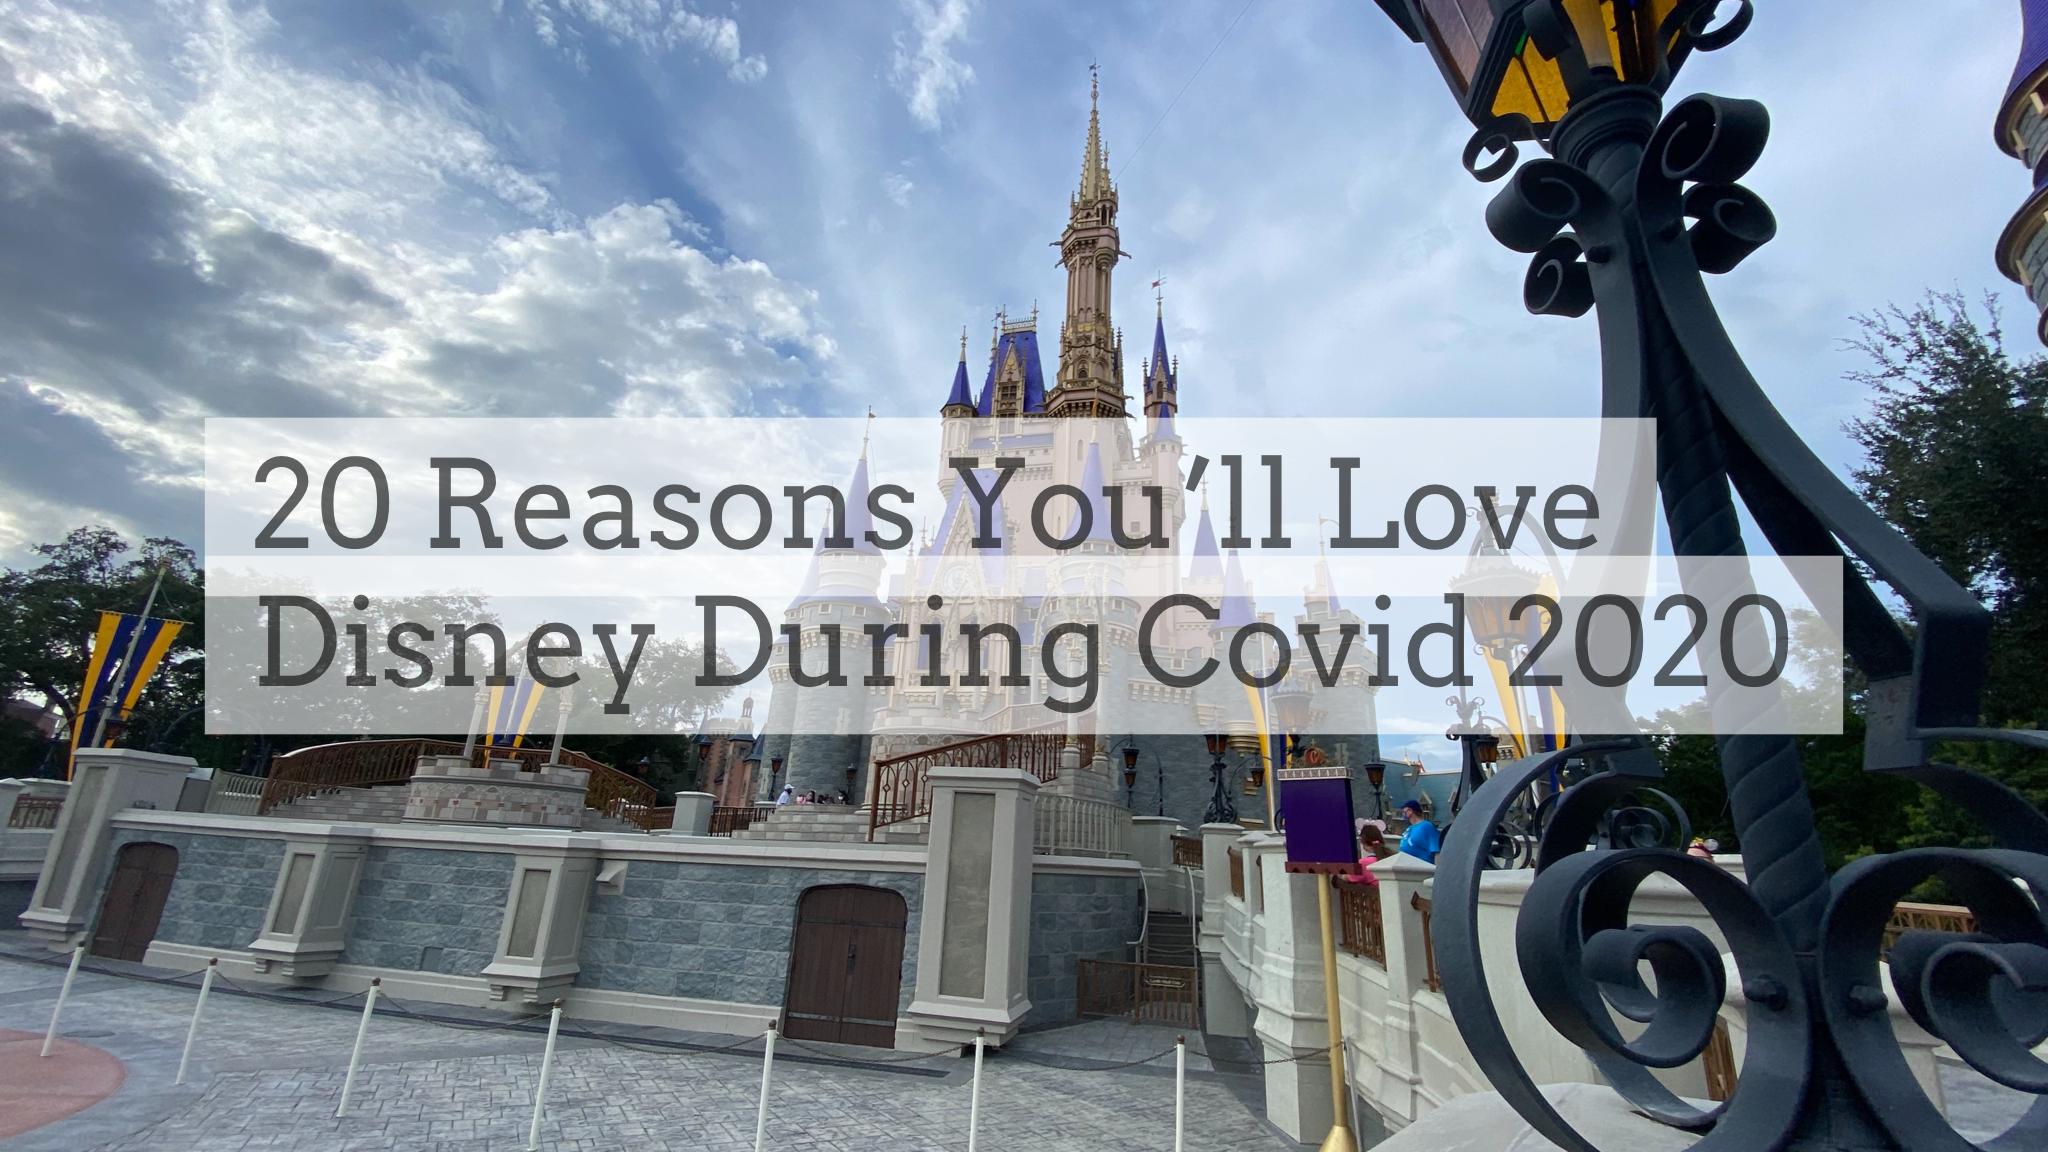 20 Reasons You'll Love Disney World During Covid